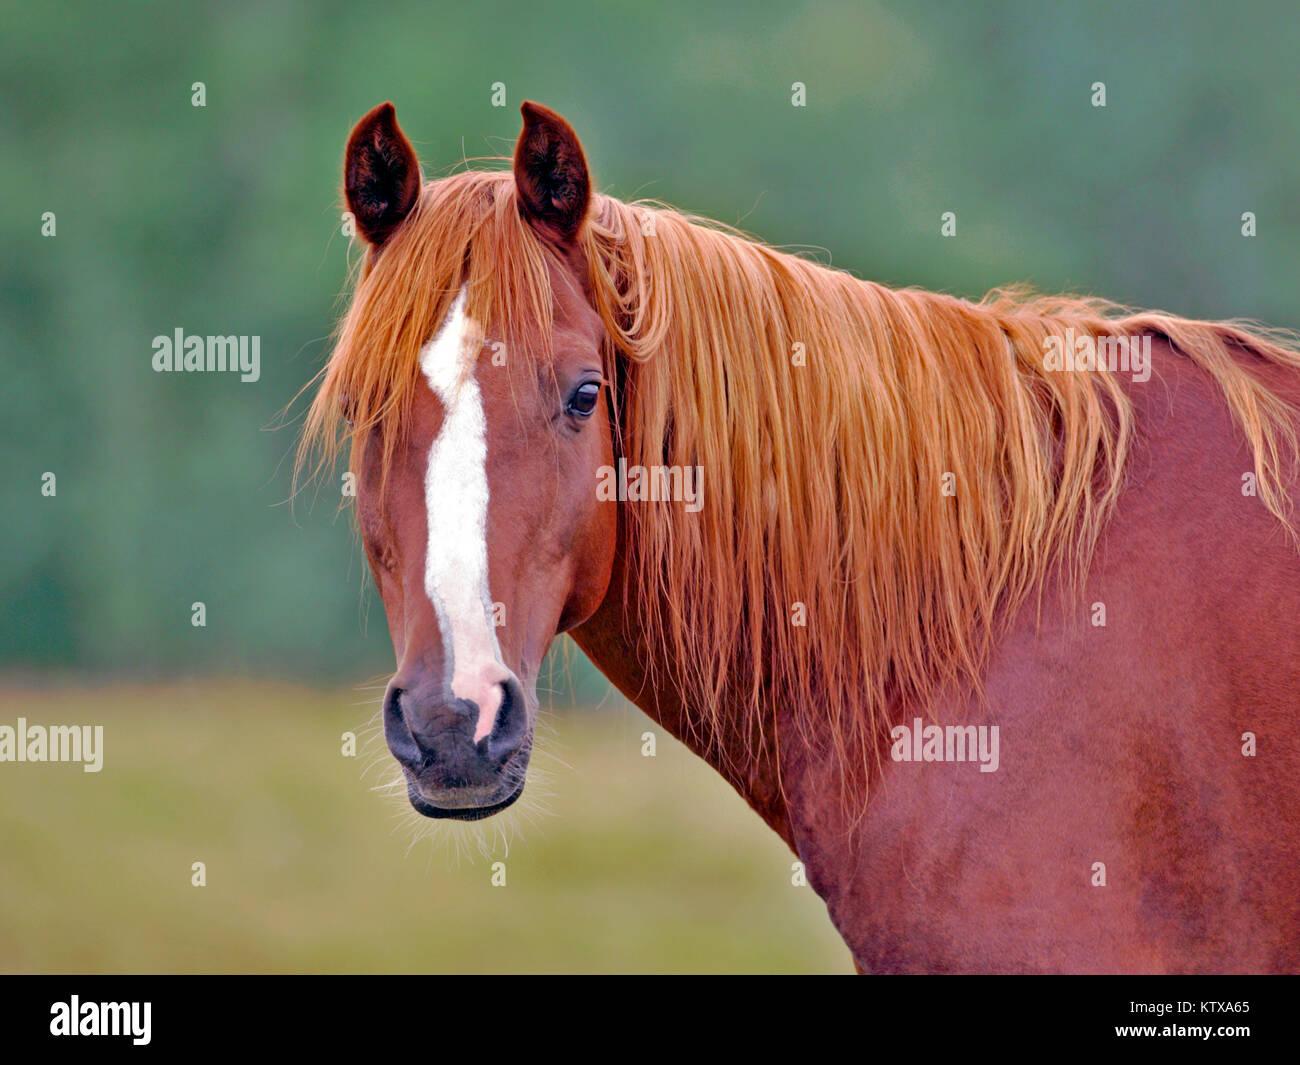 Portrait Of Beautiful Chestnut Arabian Stallion Standing In Field Stock Photo Alamy